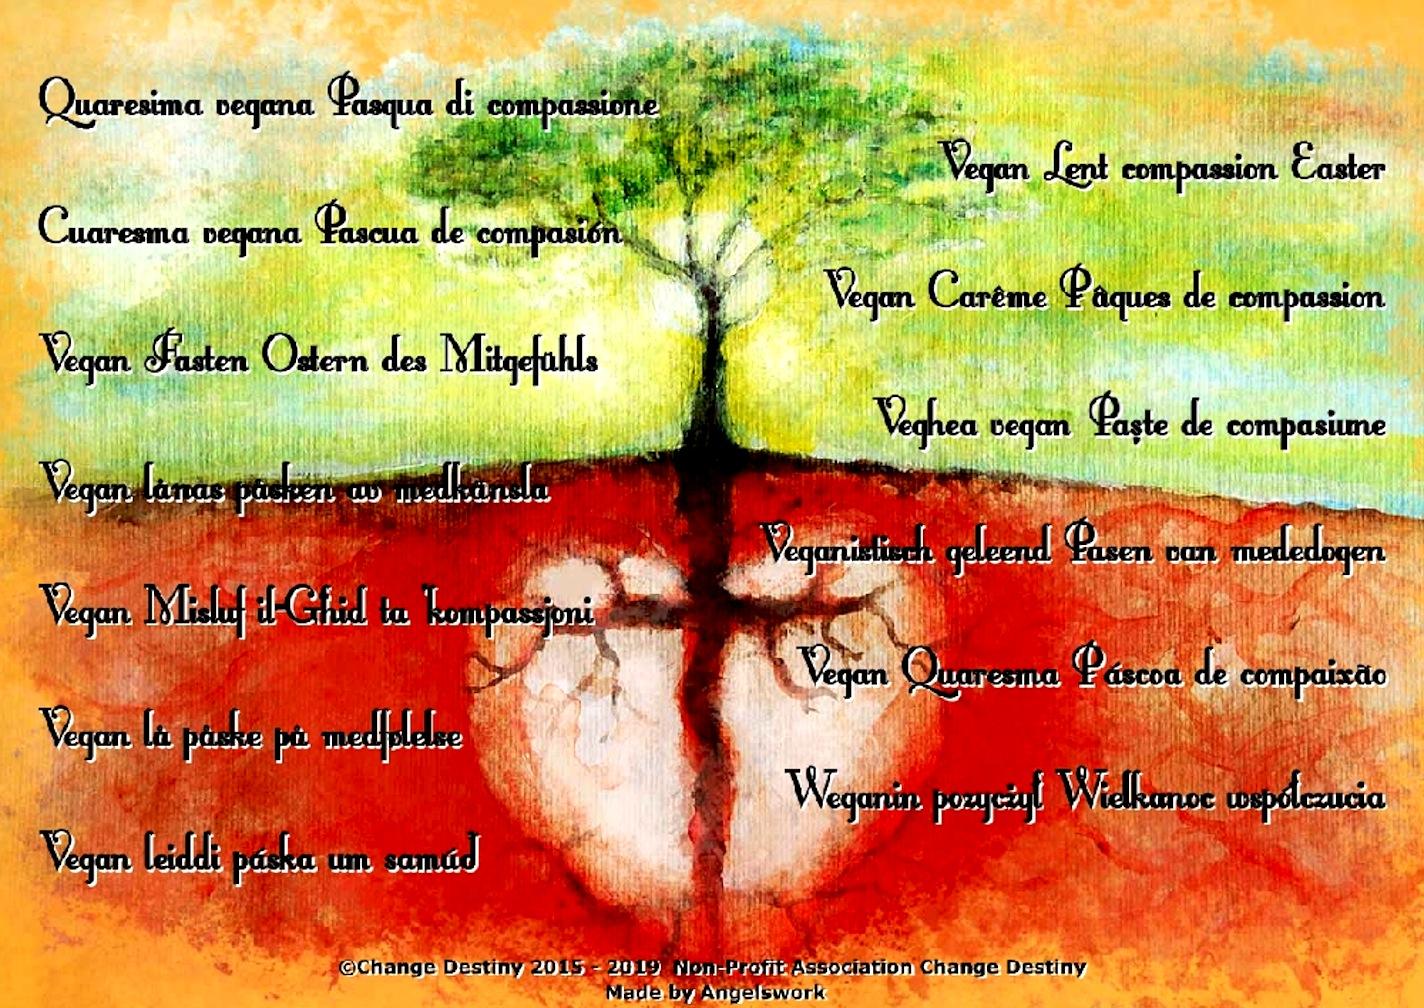 change-destiny-org_quaresima_vegana_pasqua_di_compassione